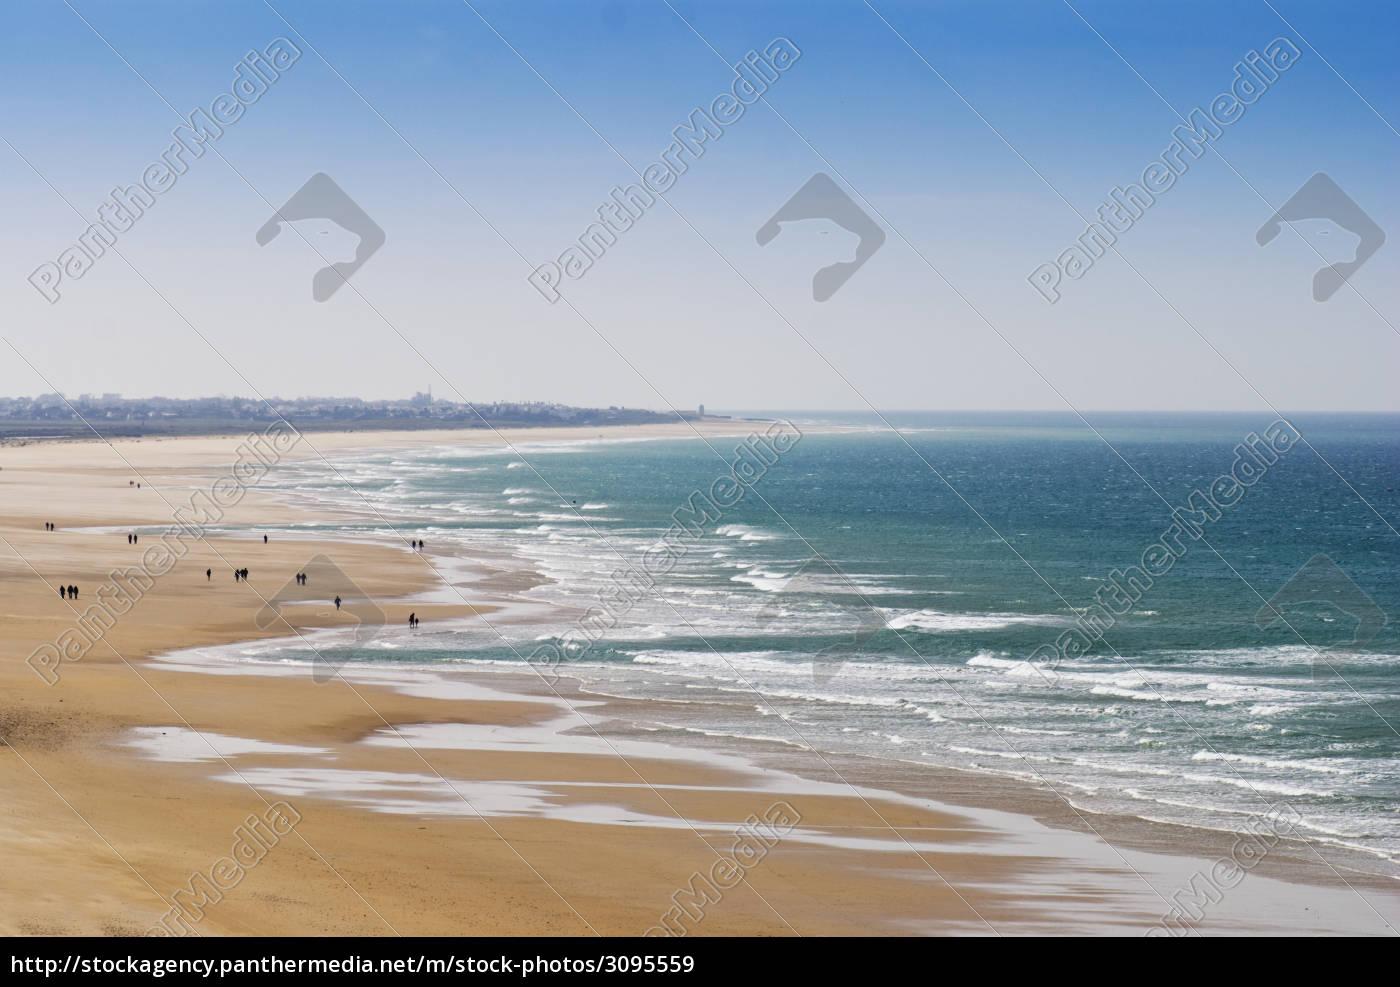 beach, on, the, costa, de, la - 3095559